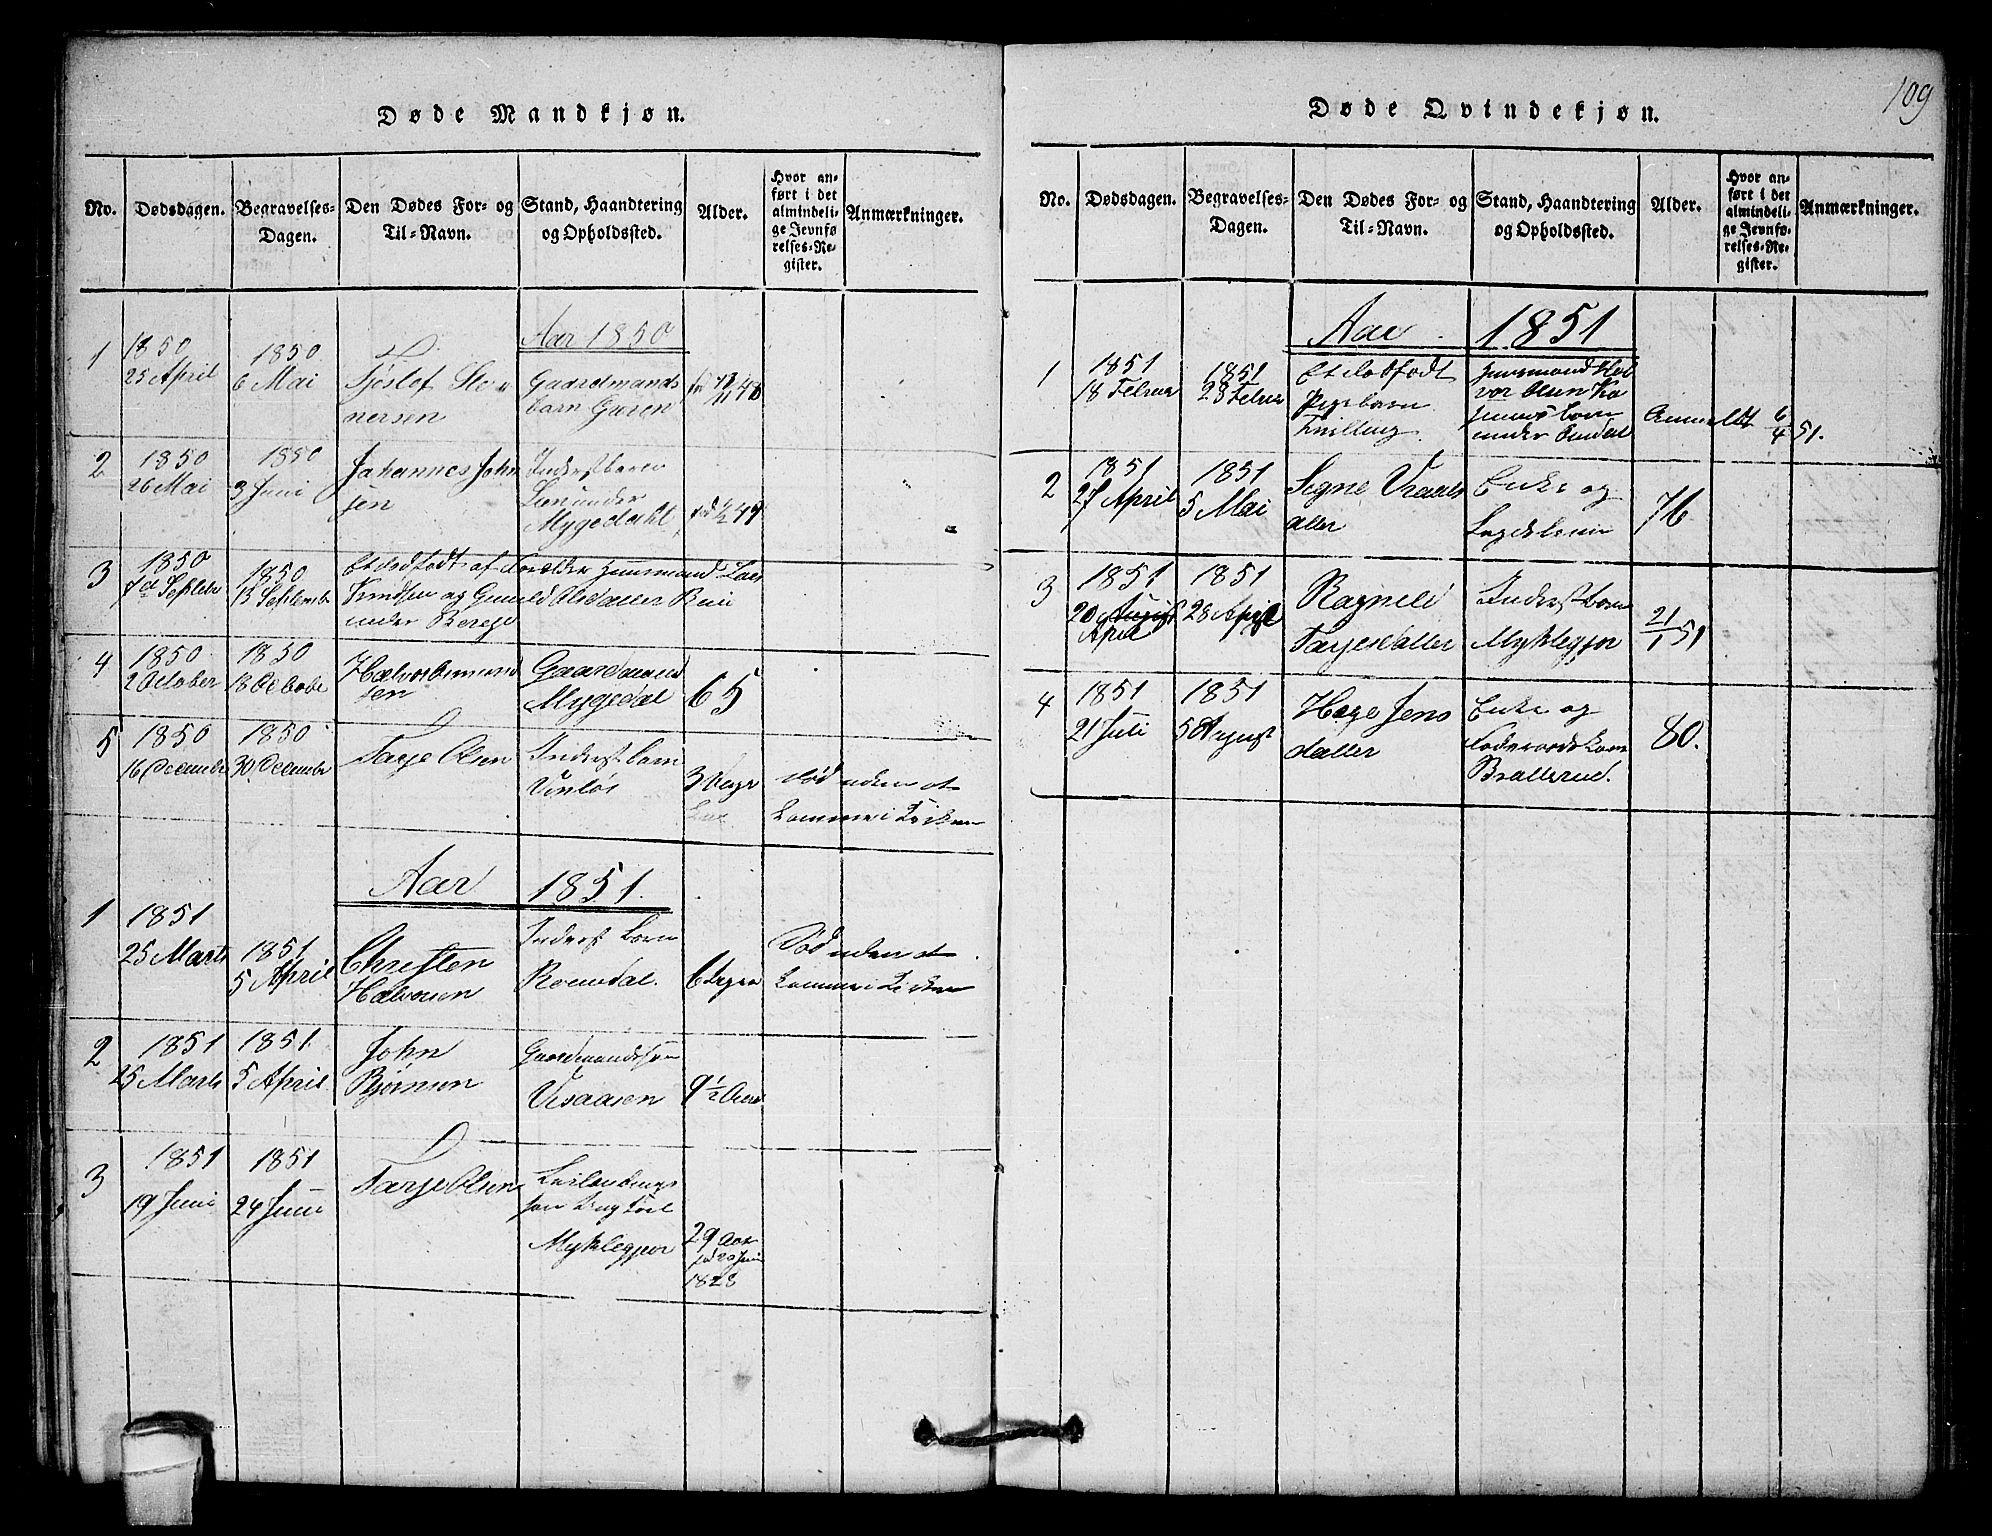 SAKO, Lårdal kirkebøker, G/Gb/L0001: Klokkerbok nr. II 1, 1815-1865, s. 109